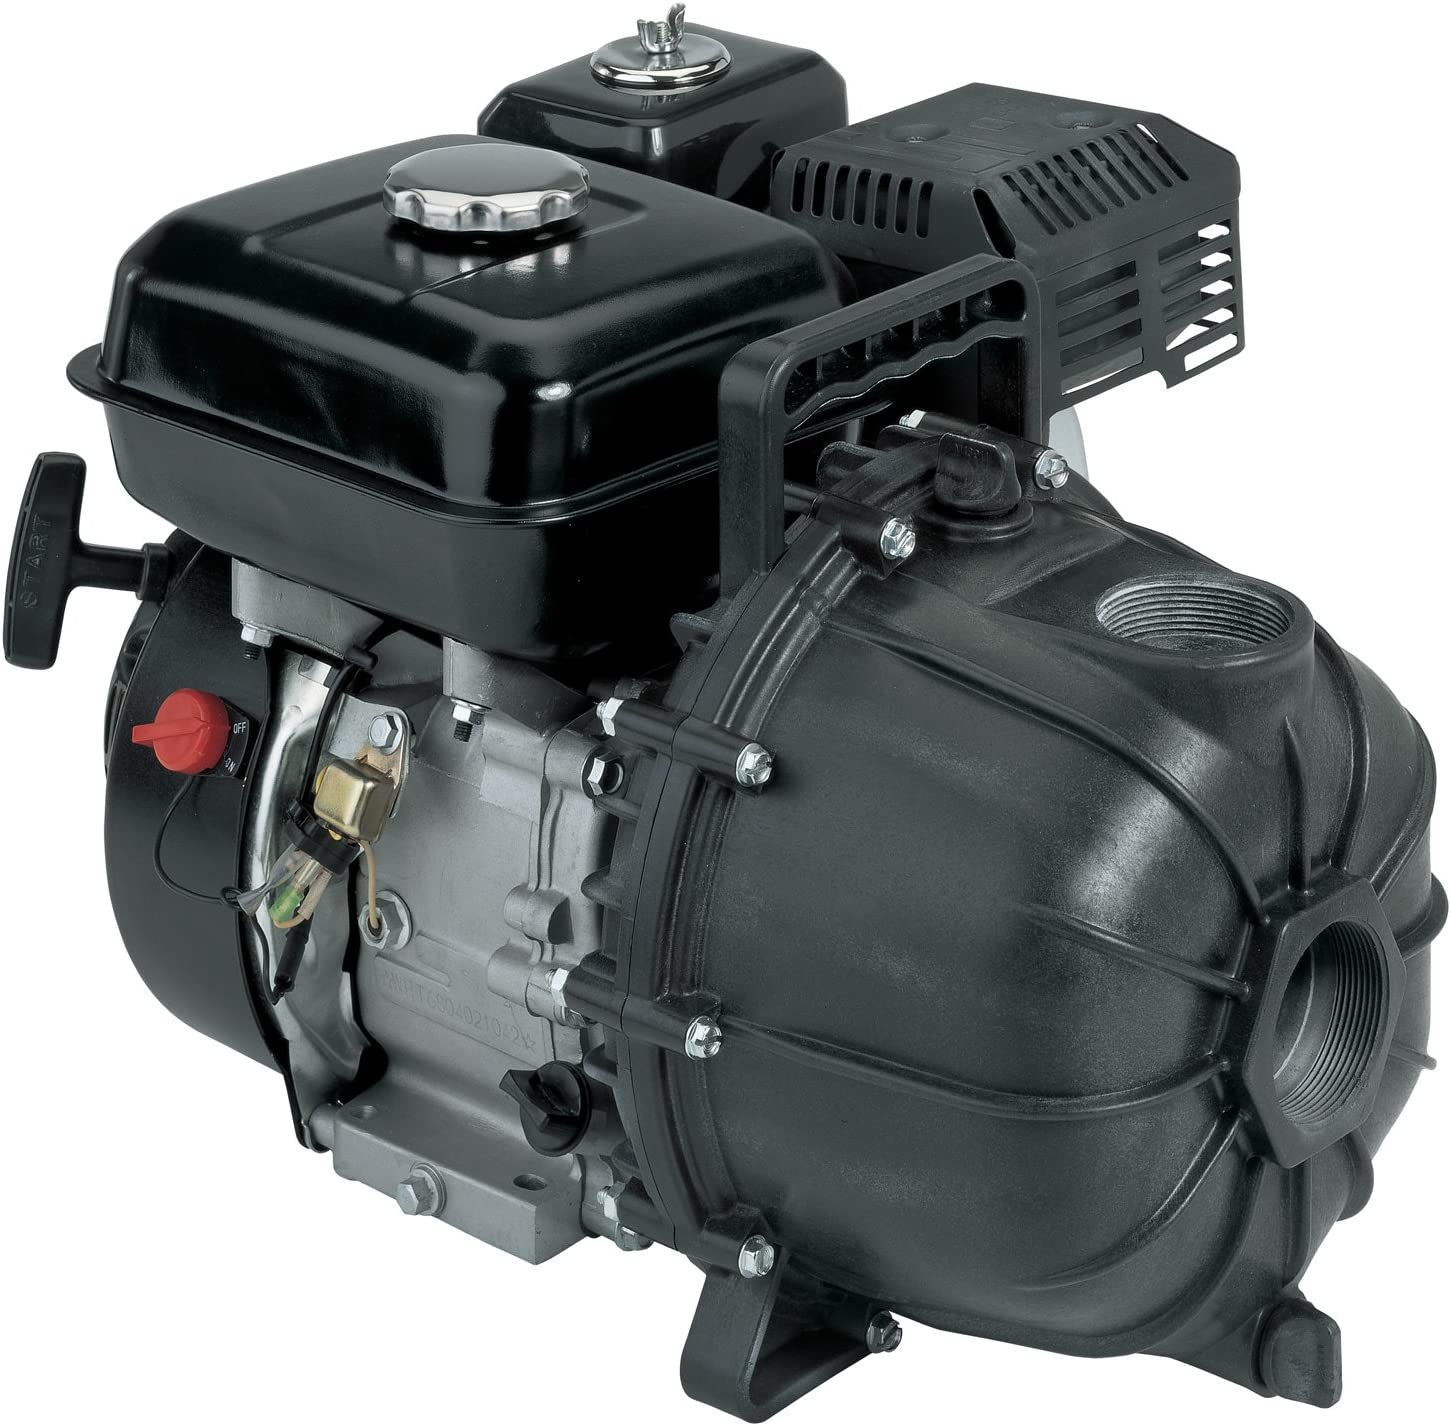 Pentair FP5455 Flotec Gas Engine Pump